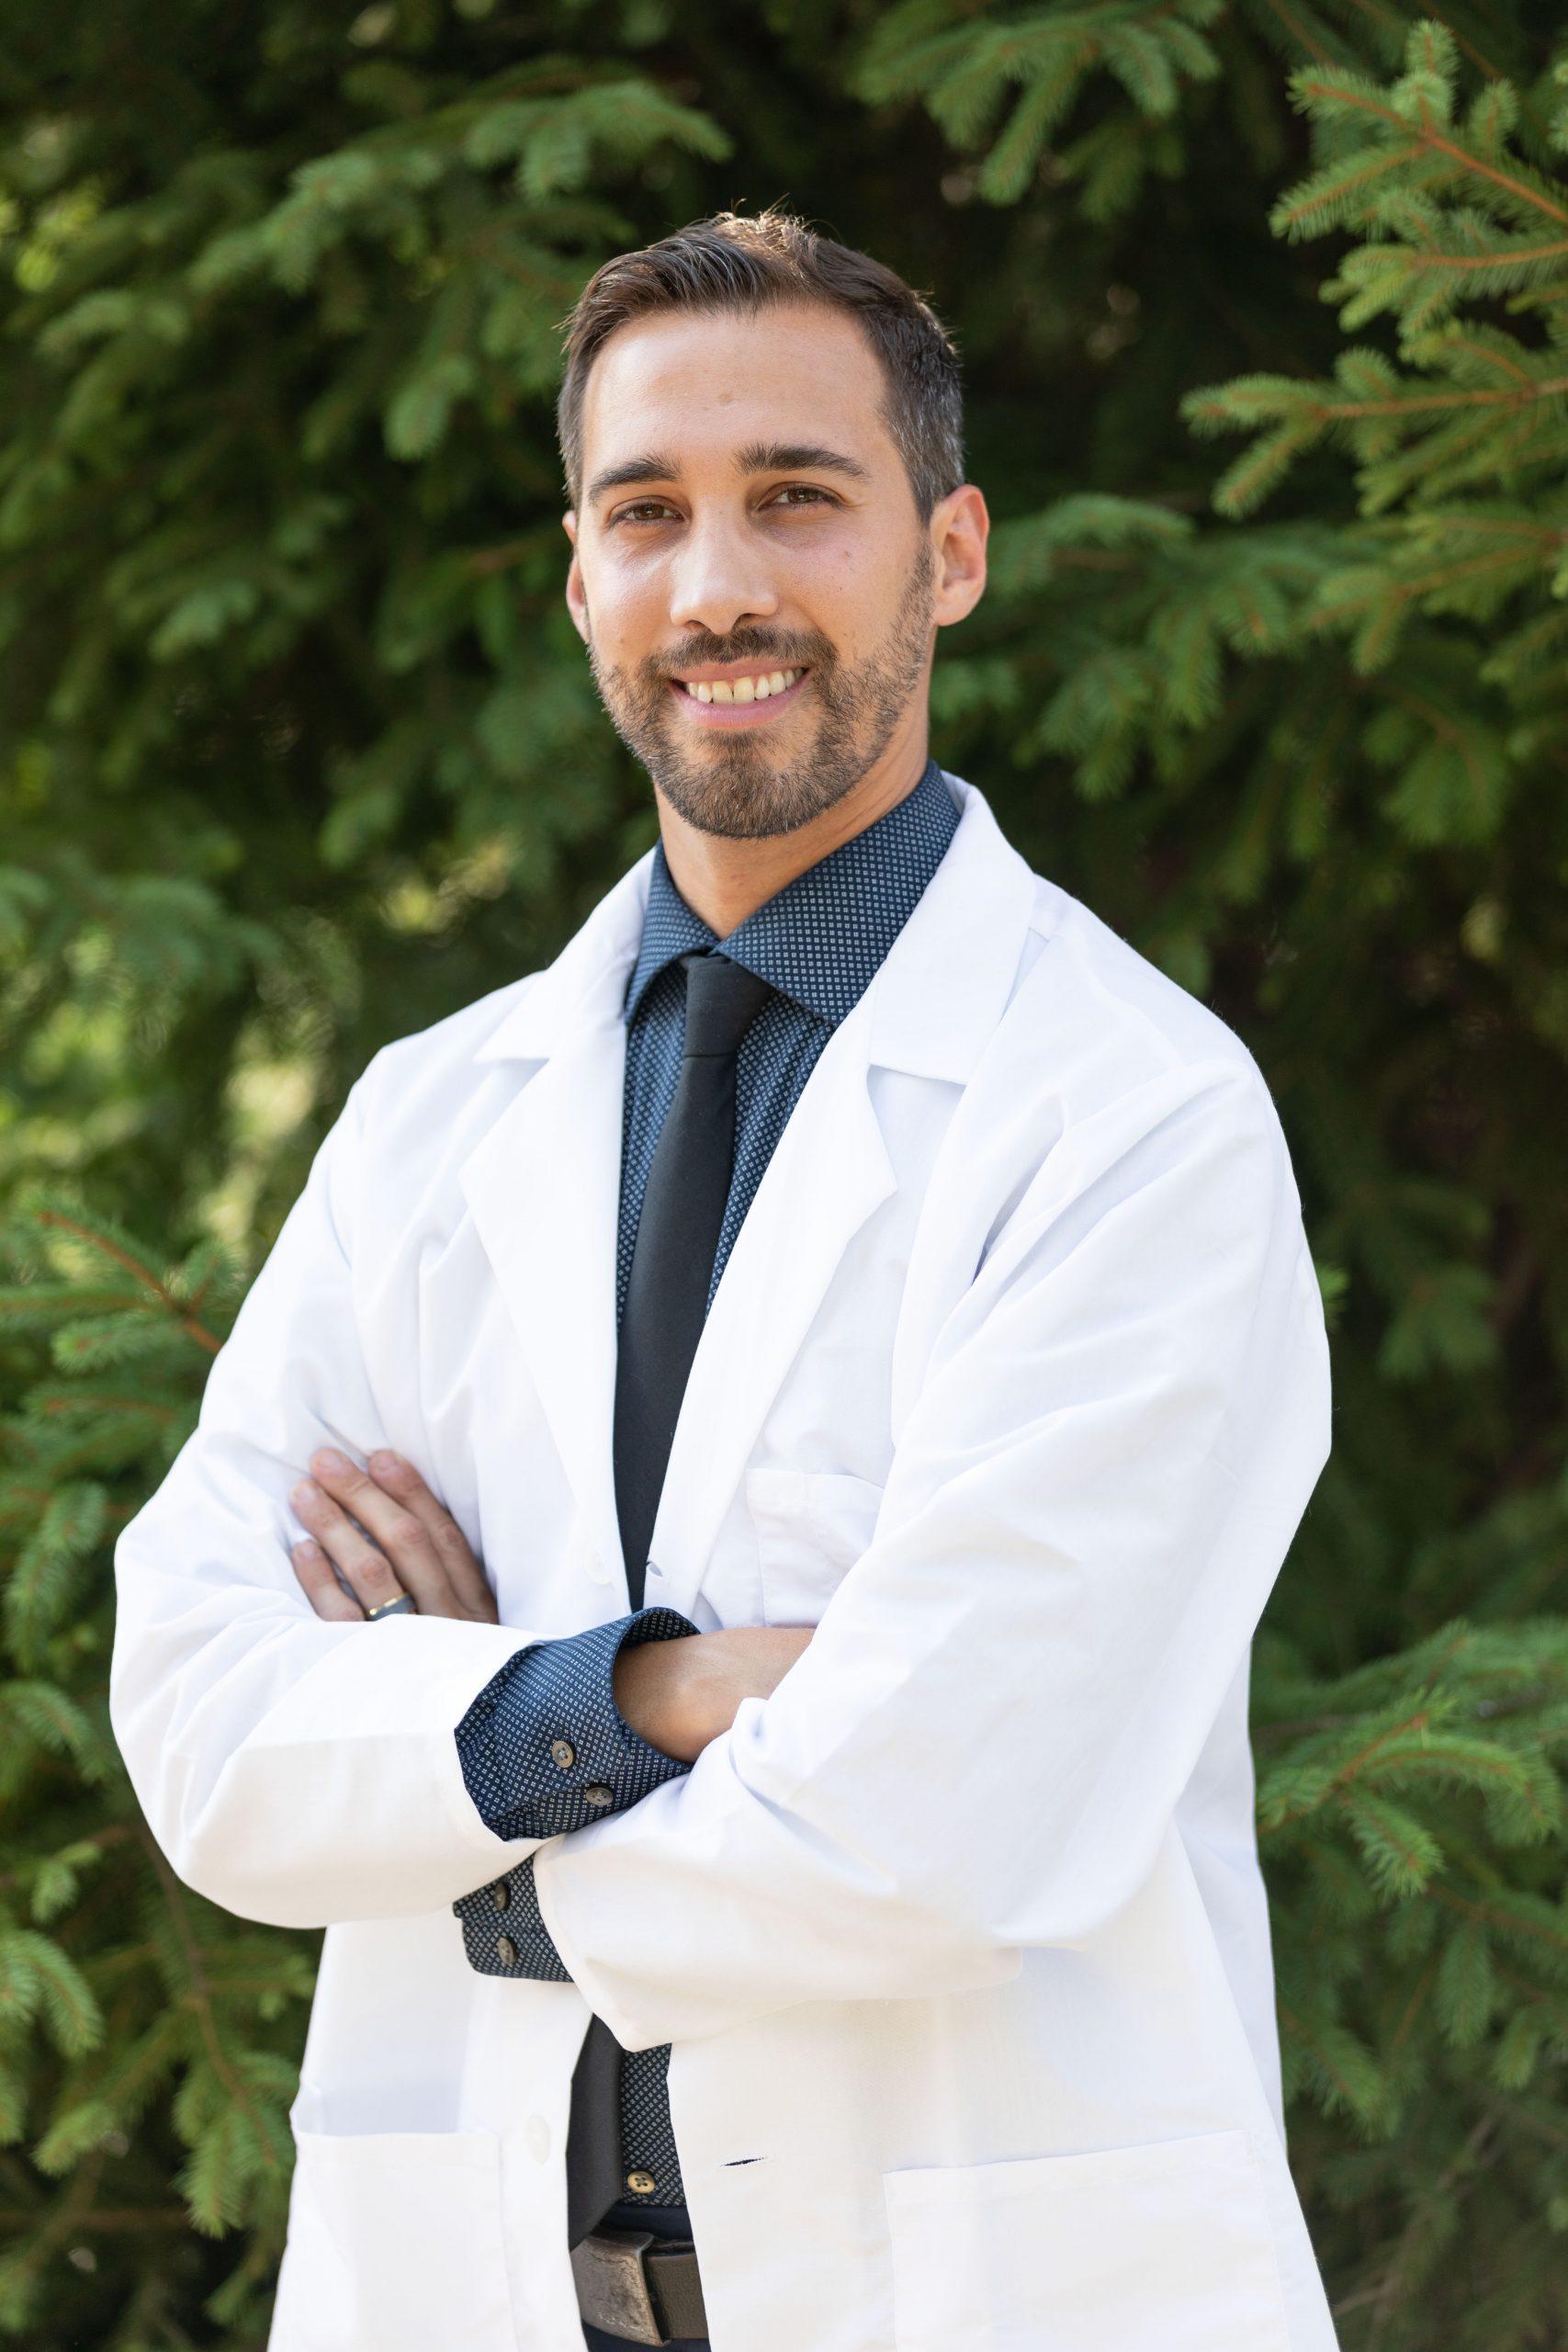 Dr. Kyle Bray